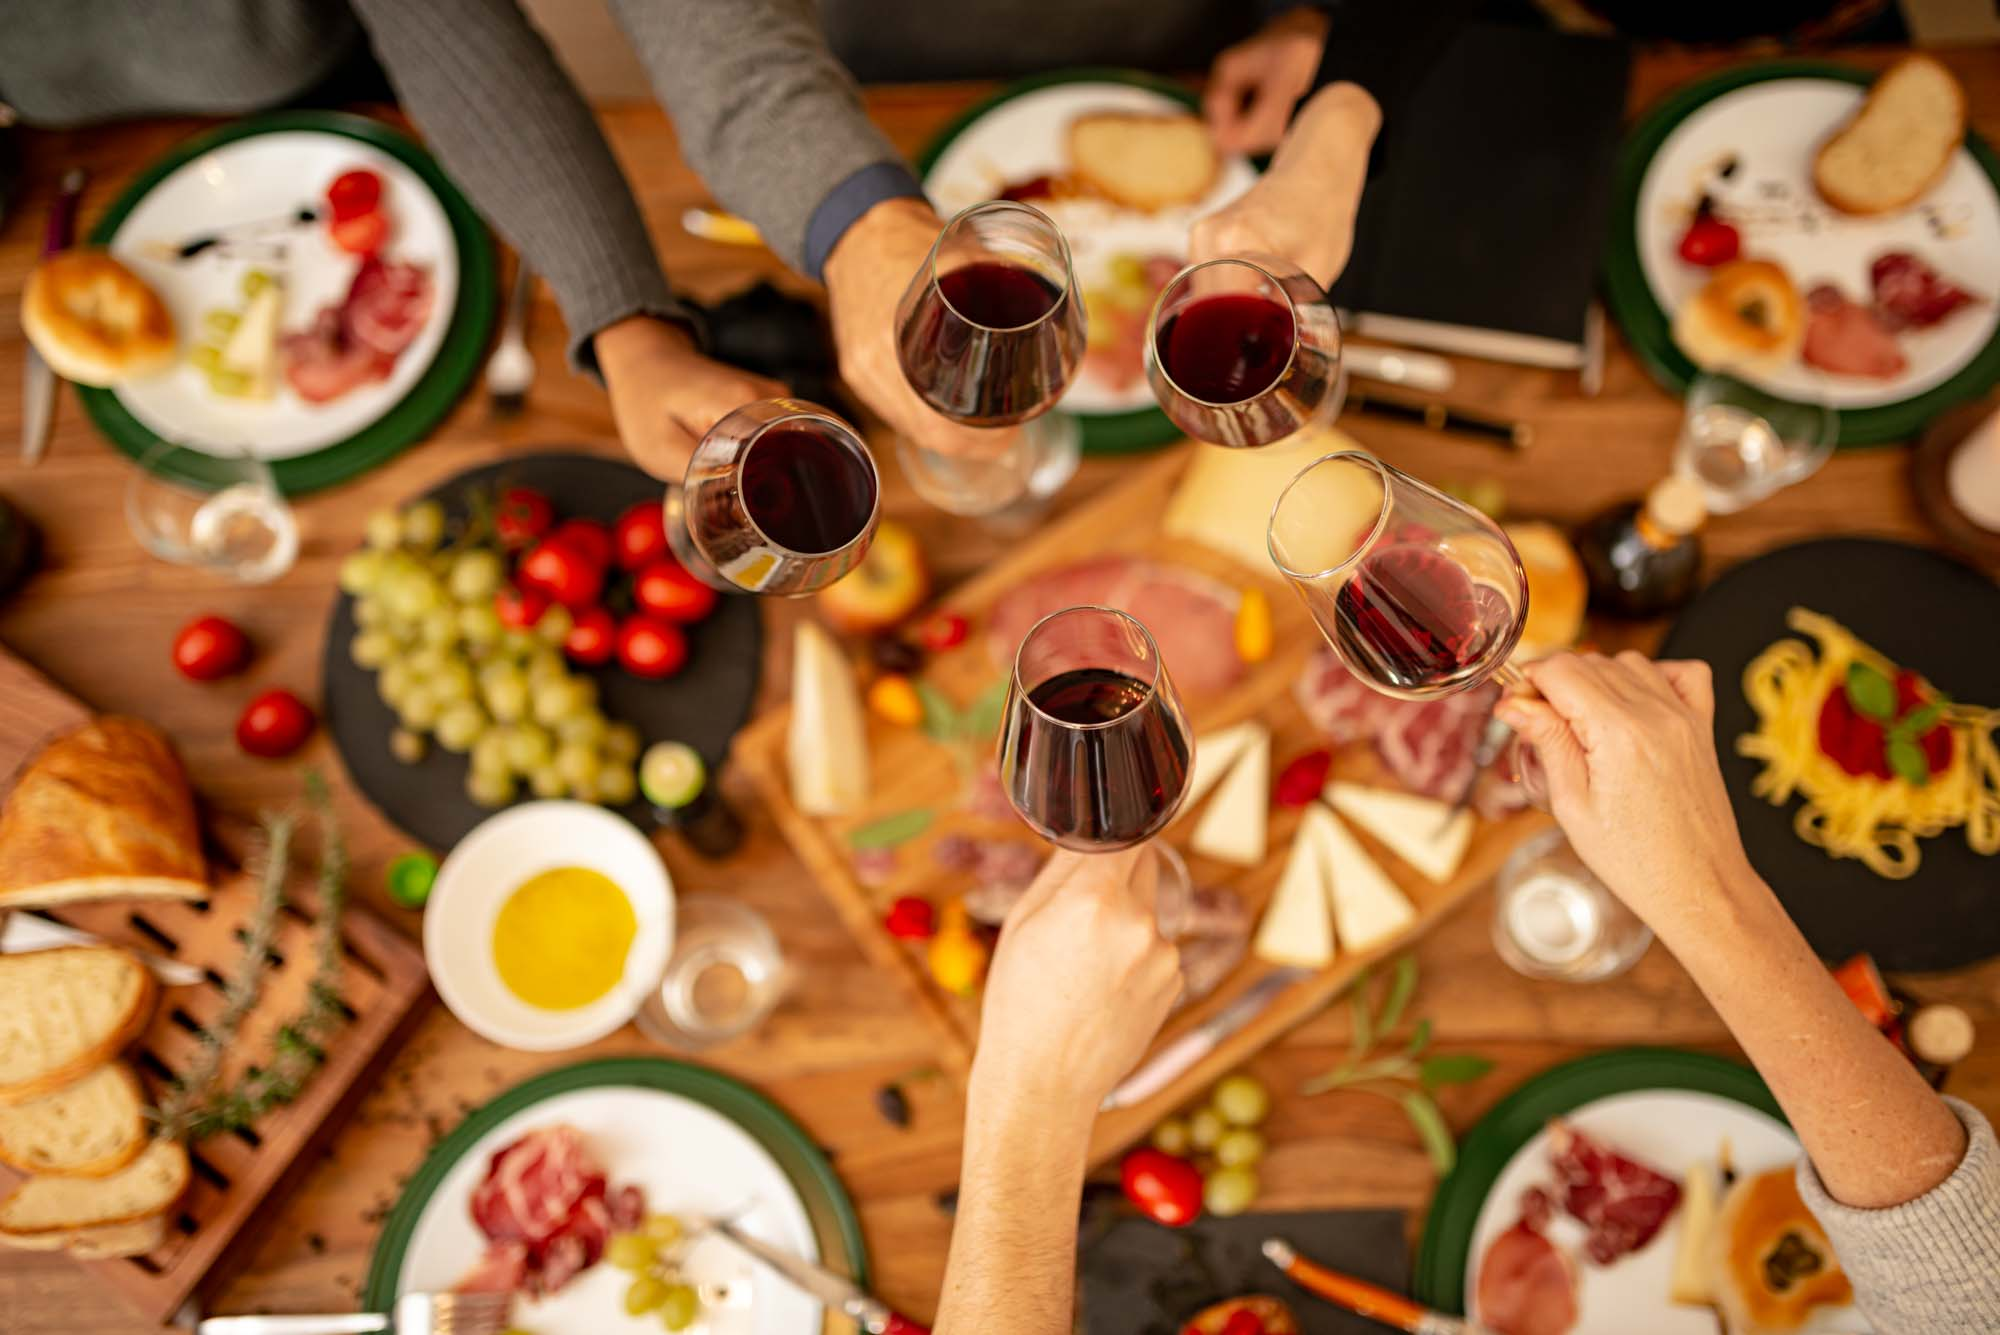 Cucina Amatoriale Eventi Aziendali a Catanzaro